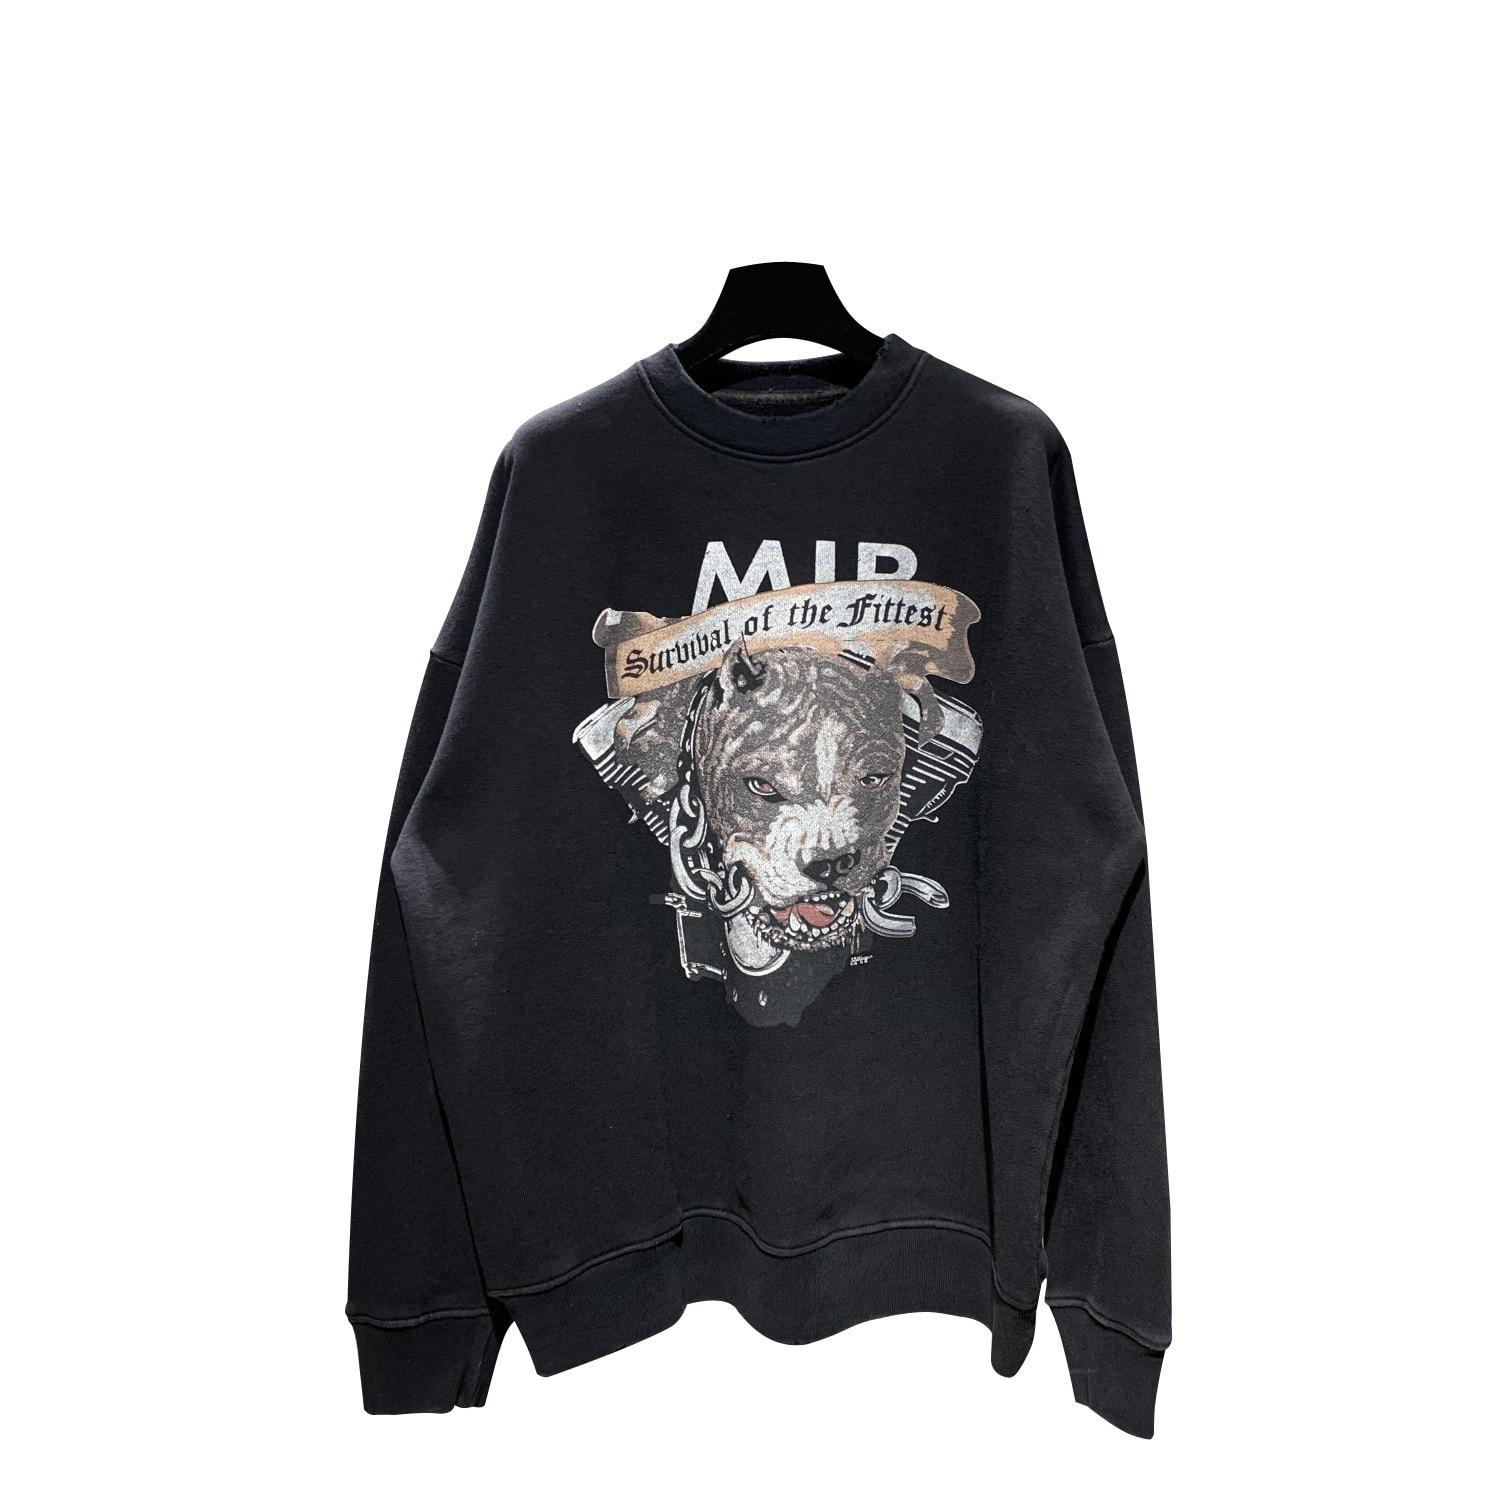 2020 Best Version 1:1 Dog Printed Women Men Sweatshirt Hoodies Hiphop Streetwear Men Casual Cotton Sweatshirt Pullover